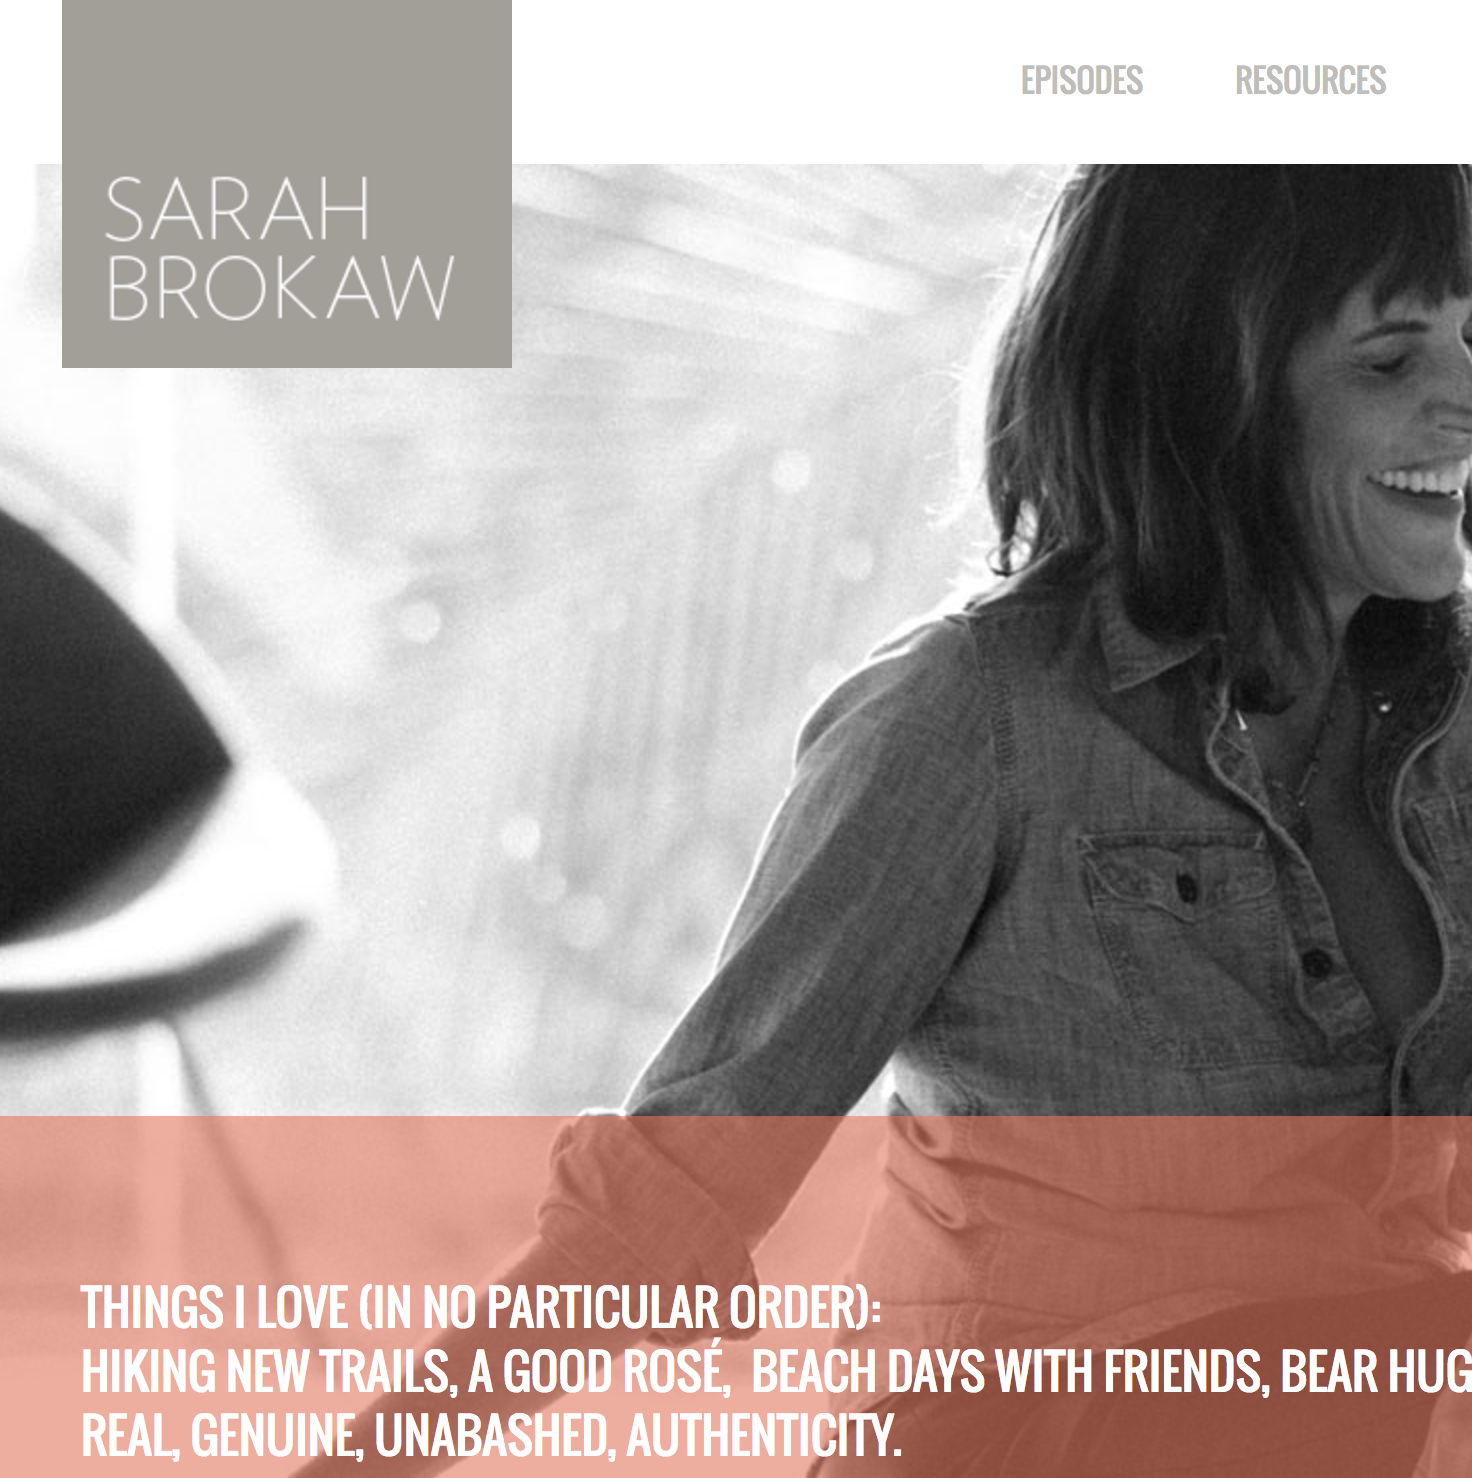 Copy of Sarah Brokaw - Shared Secrets - Mila Morgan Studio - Microcurrent Therapy